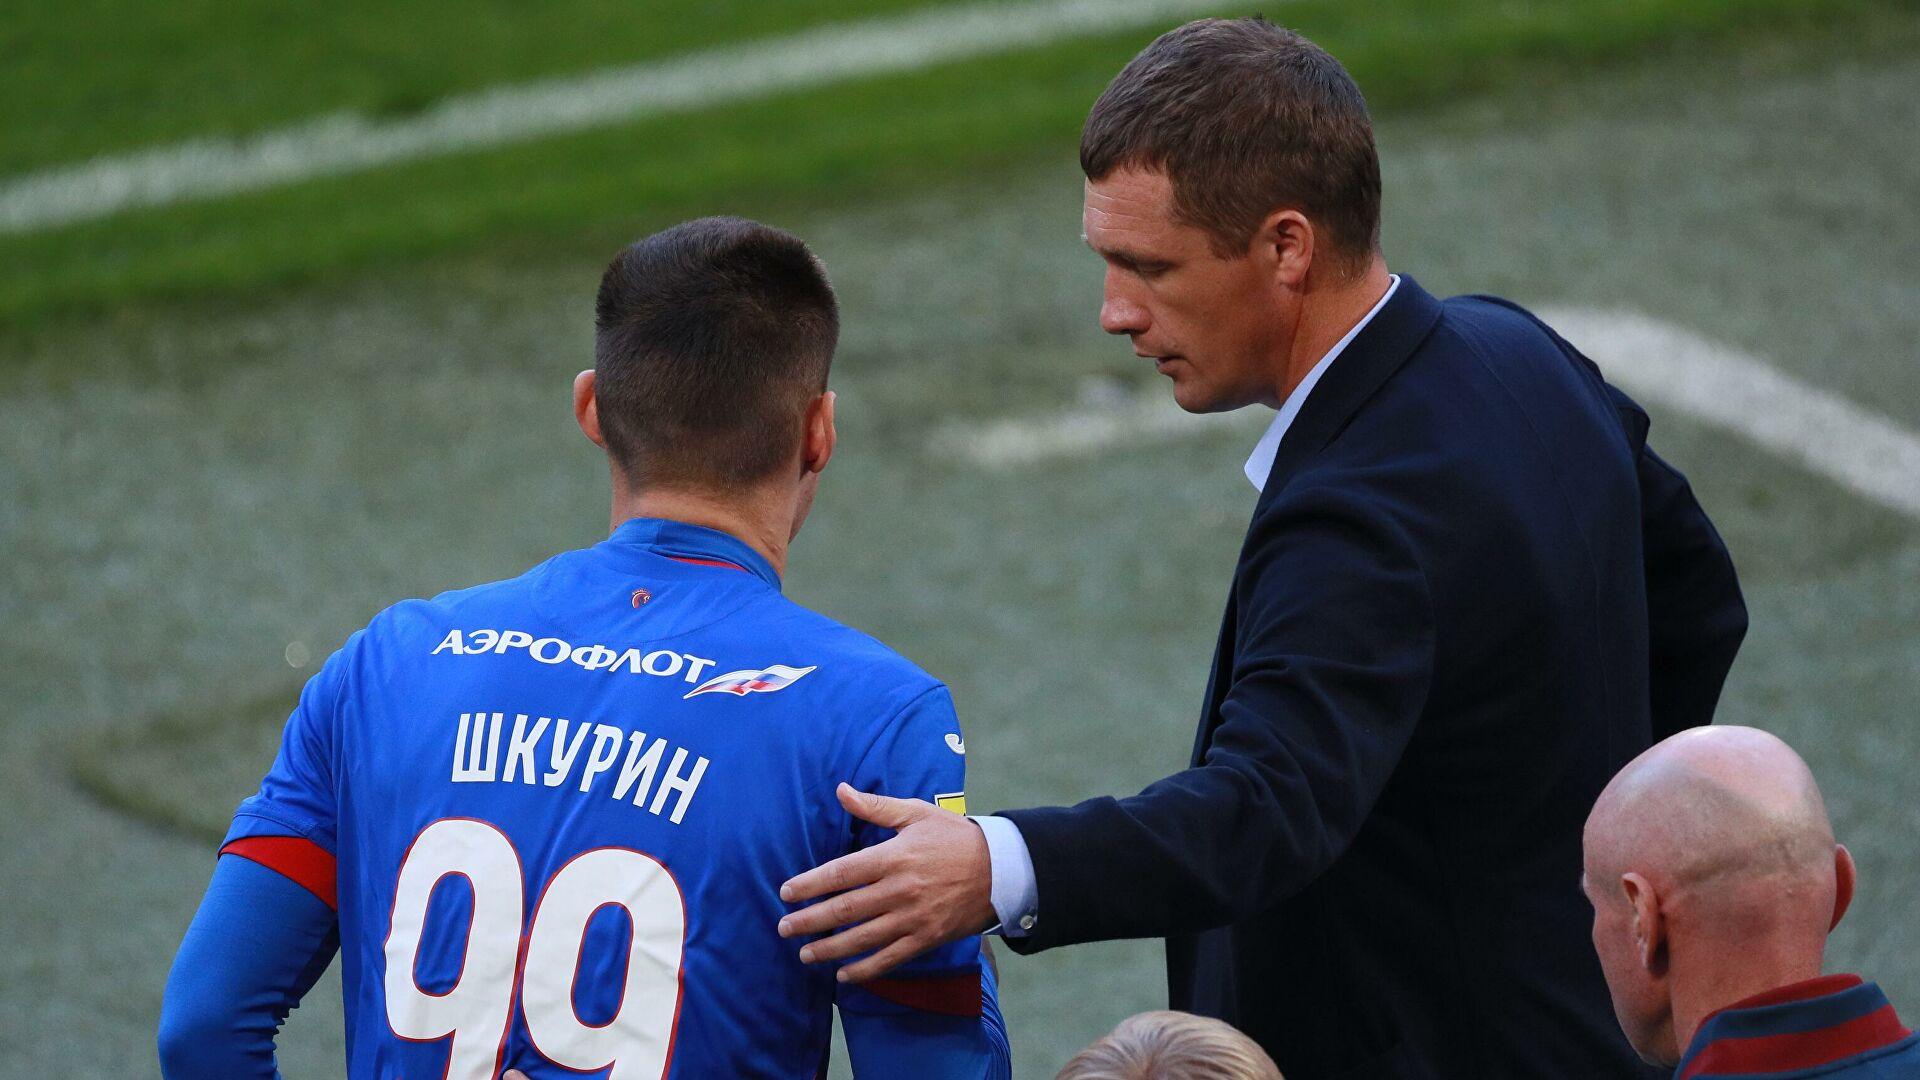 Transfermarkt: Шкурин может перейти в «Краснодар»